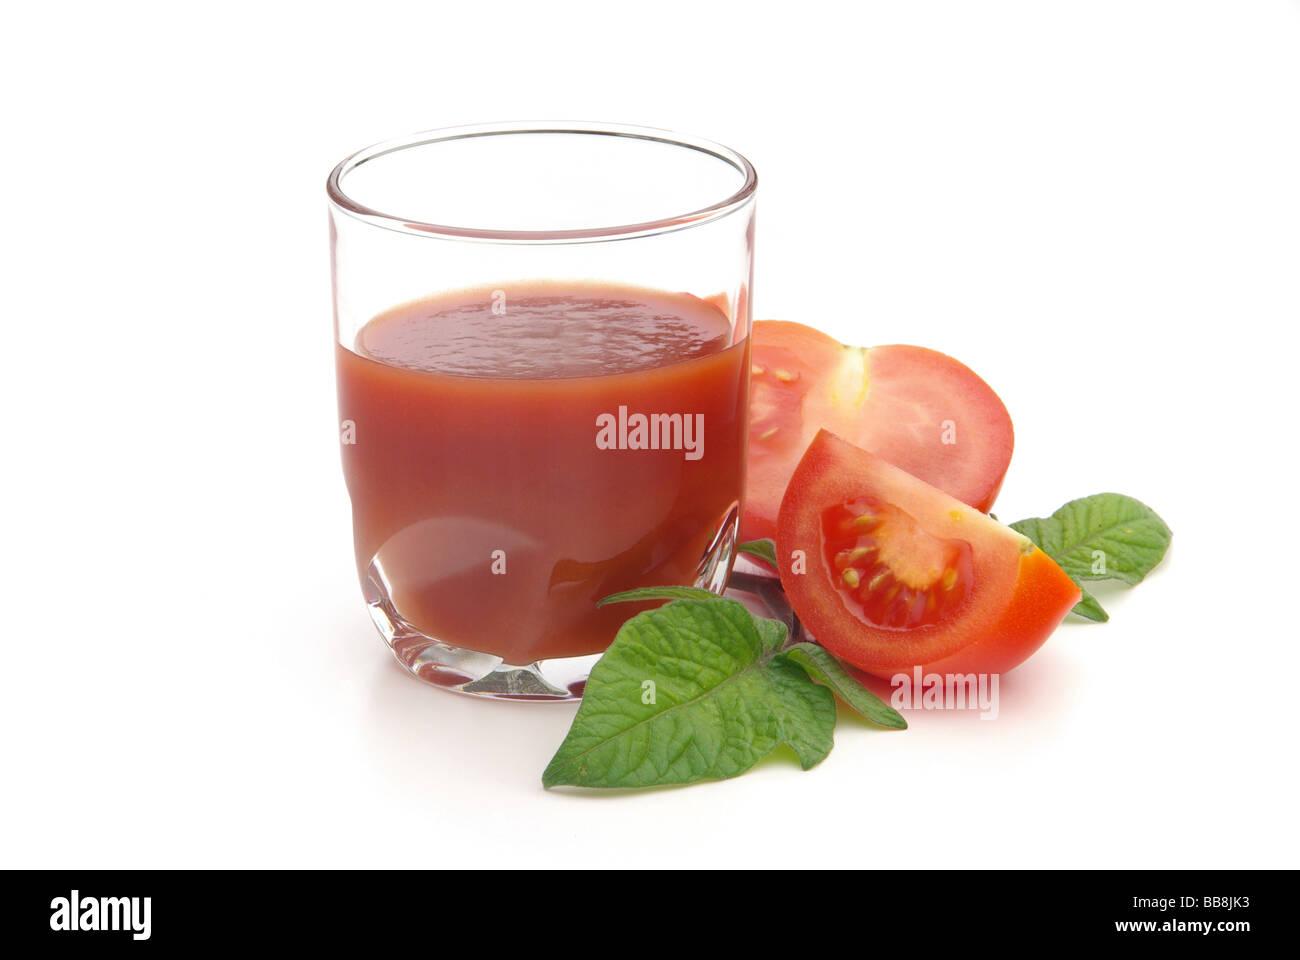 Tomatensaft tomato juice 02 - Stock Image